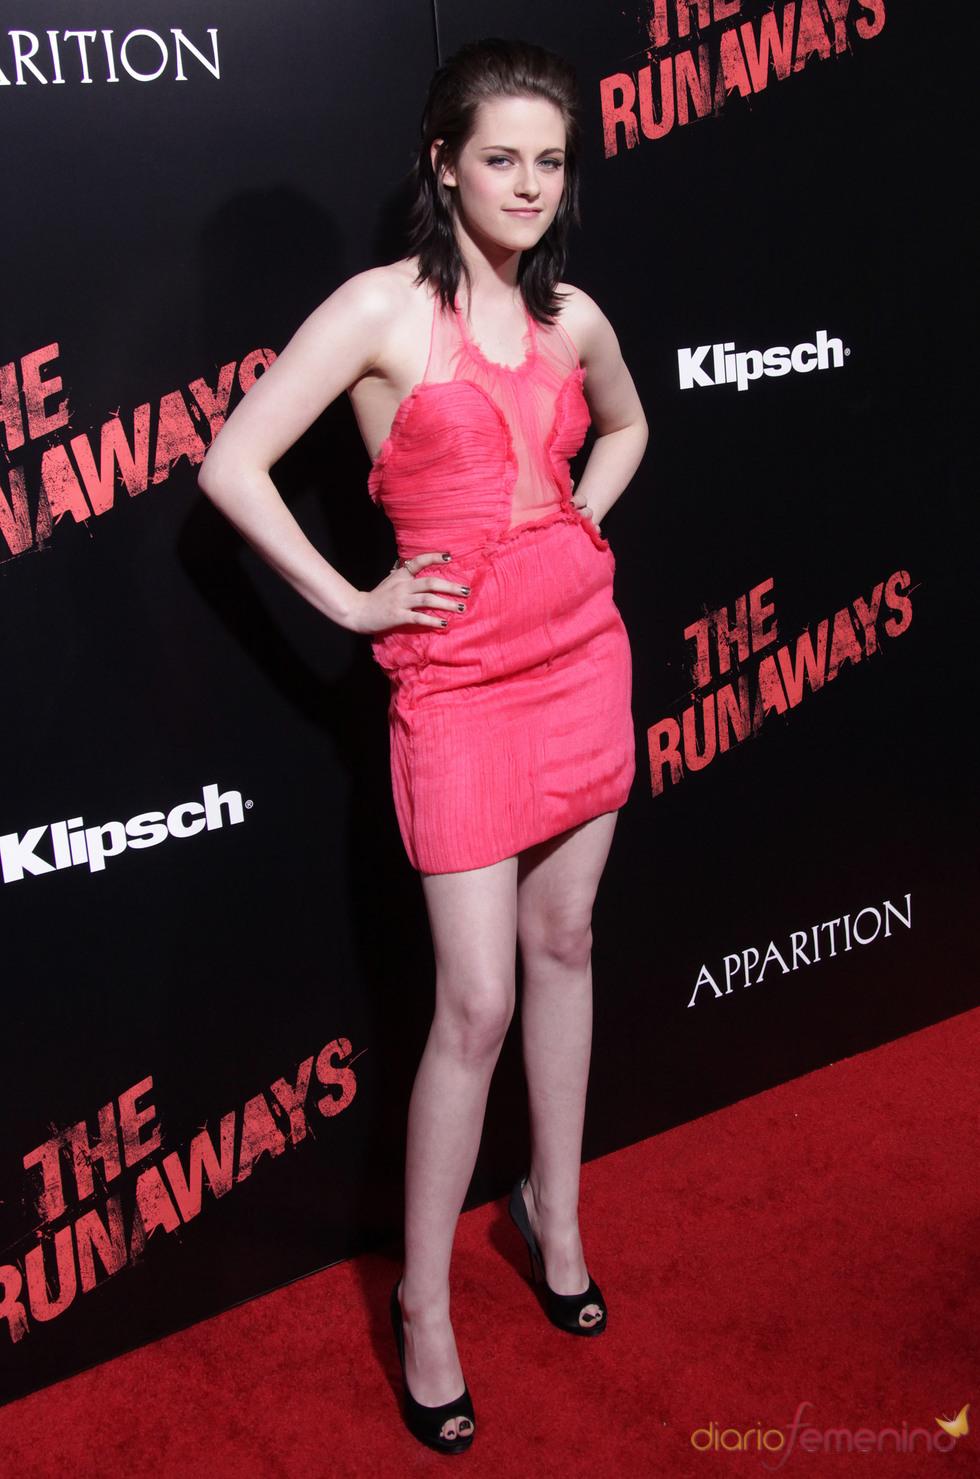 Premiere de 'The Runaways': Kristen Sewart, radiante